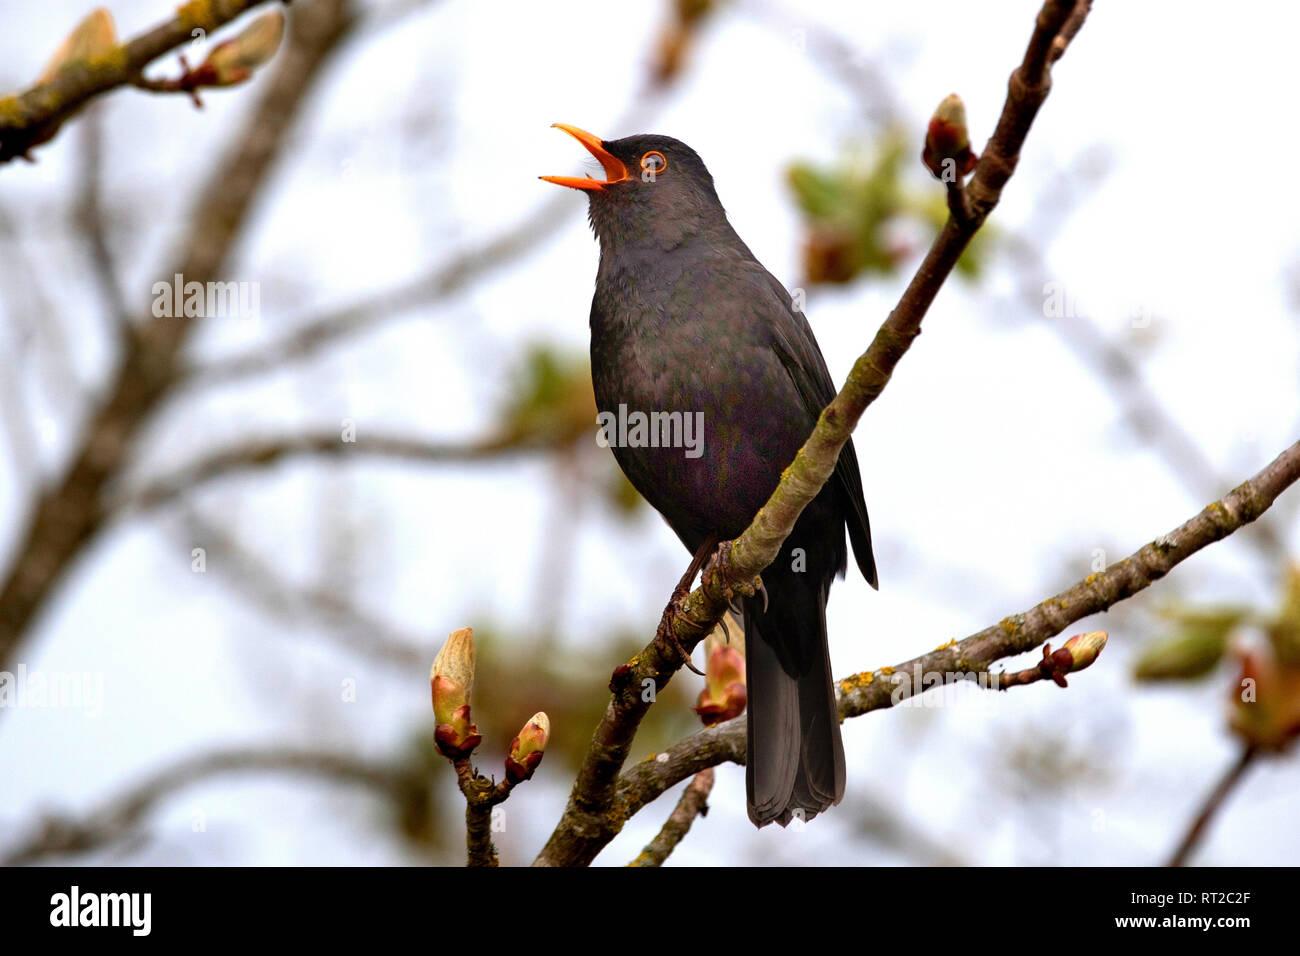 Blackbird, blackbird in the spring, throttle, throttles, real throttles, cultural followers, black throttle, singing blackbird, songbird, sparrow's bi Stock Photo